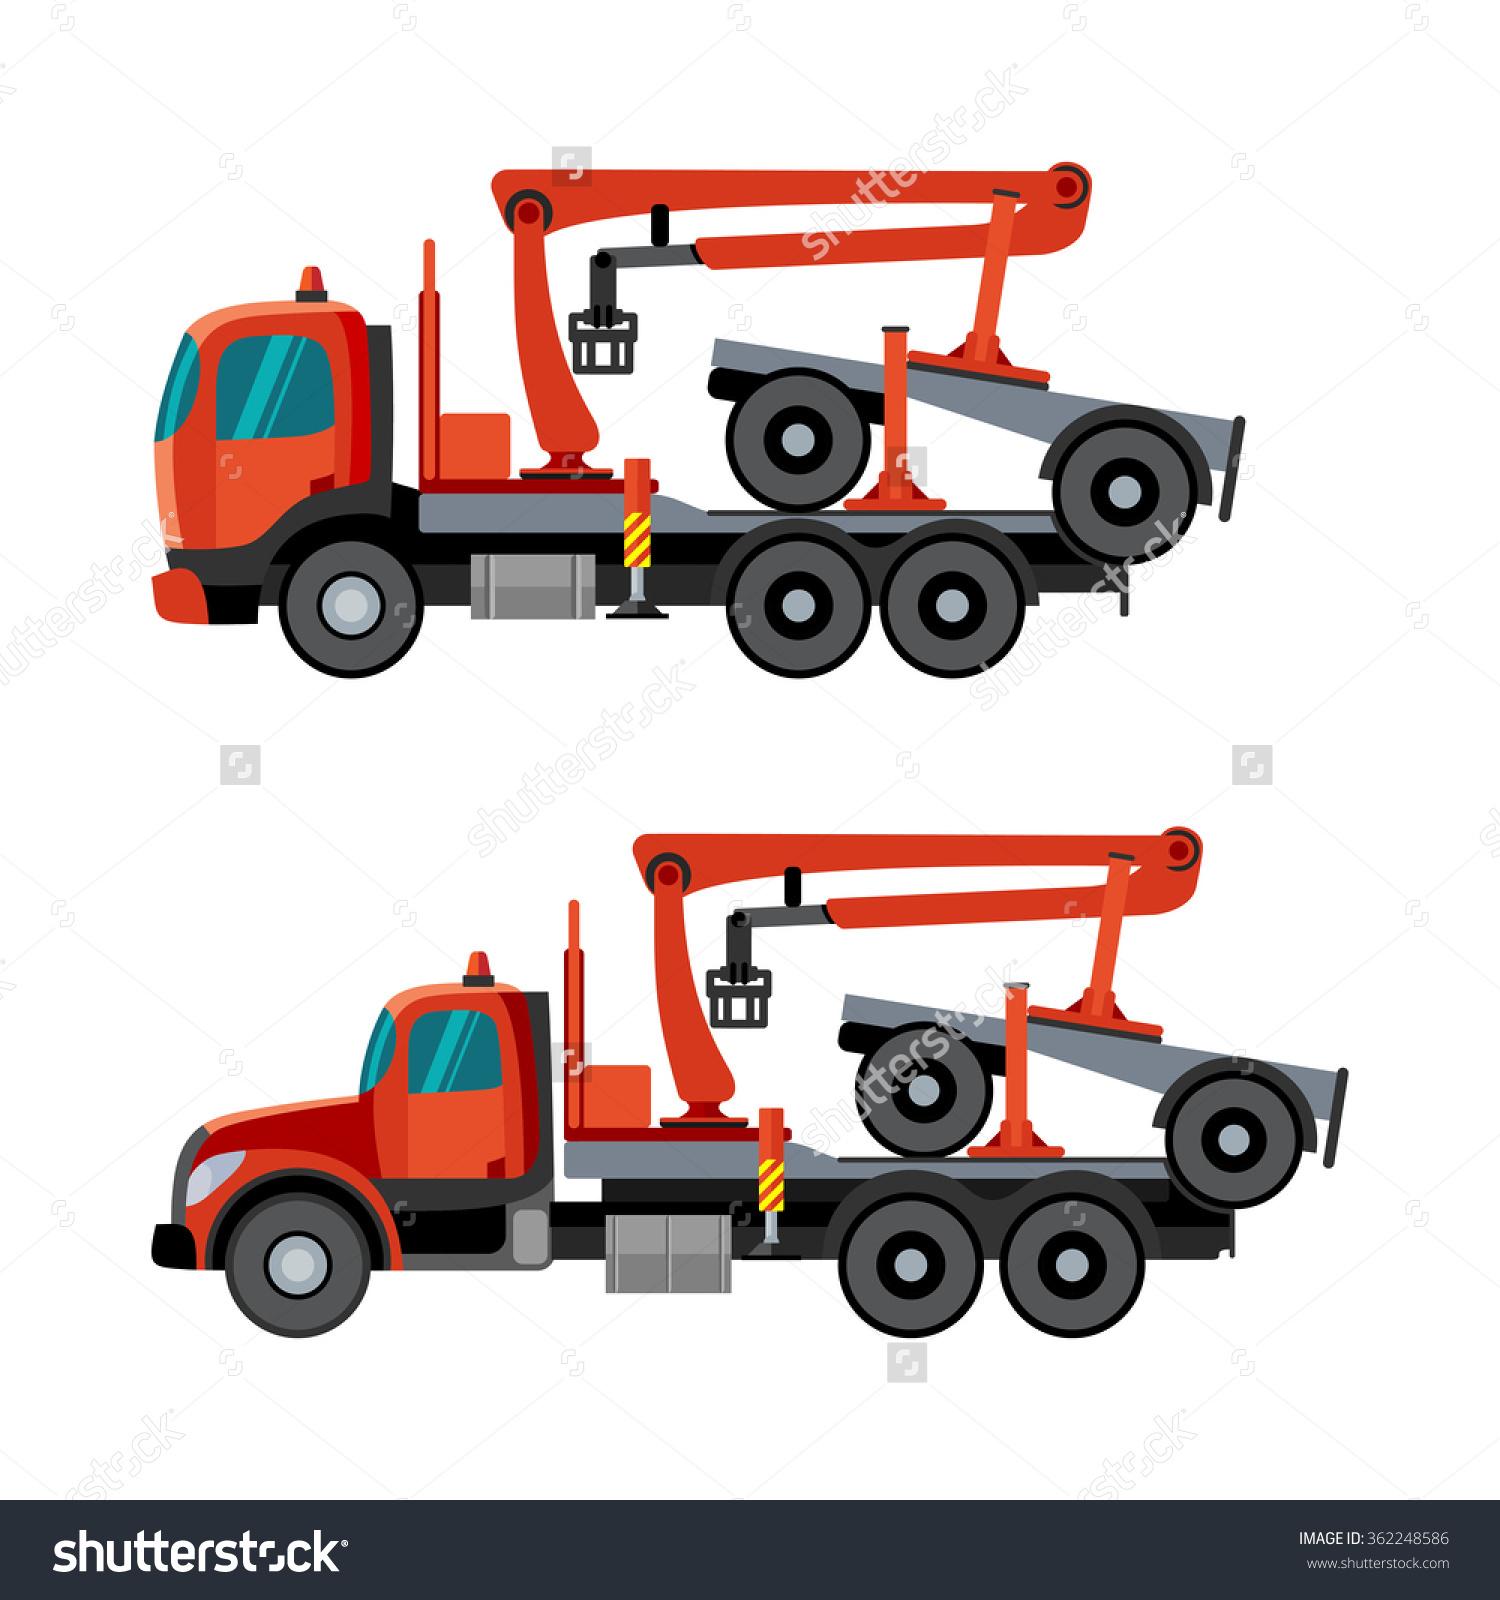 Hydraulic Truck Crane Clip Art.